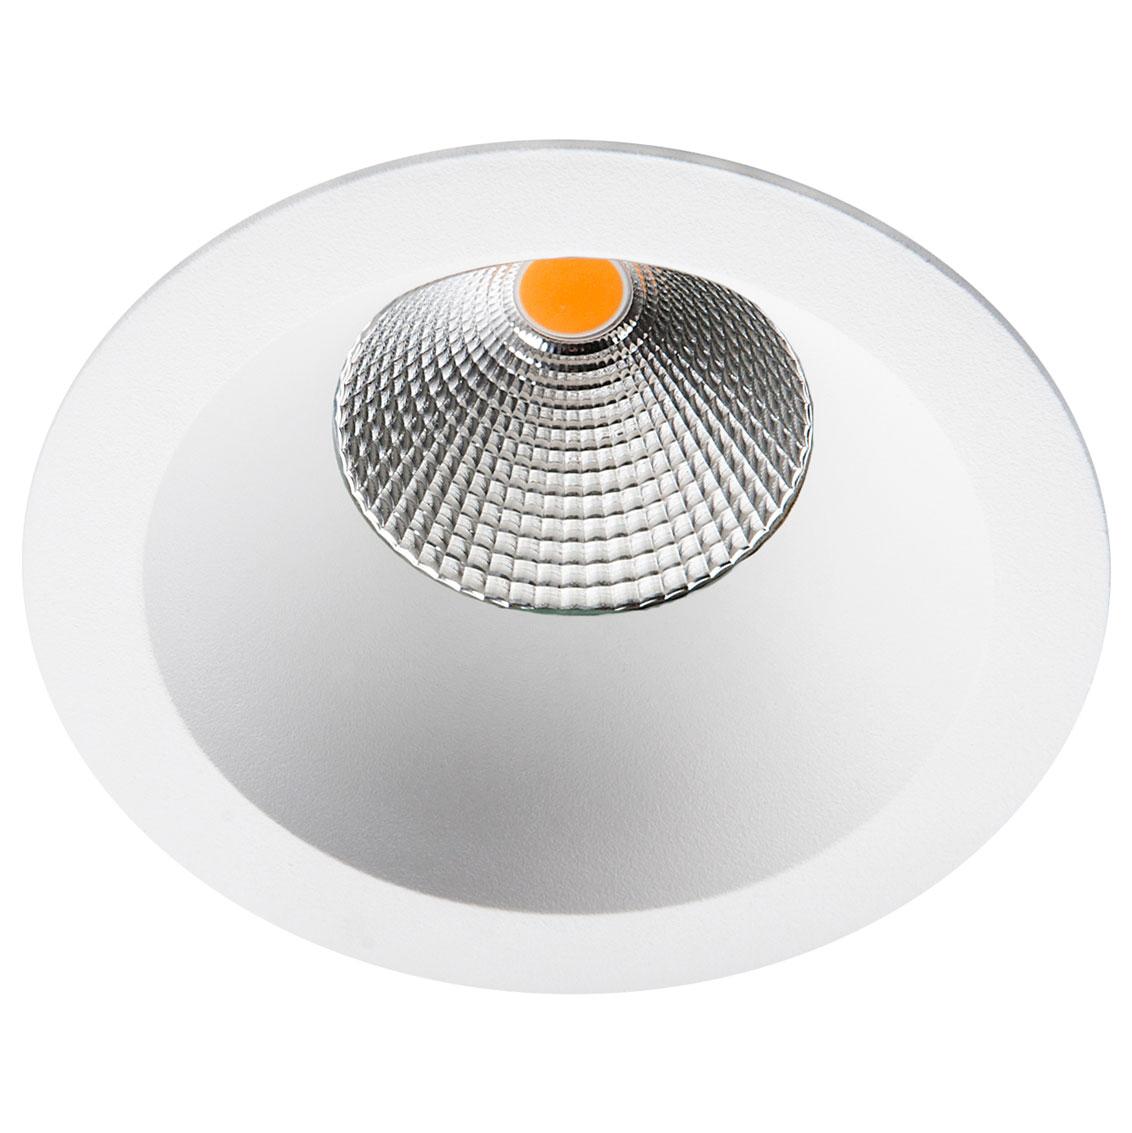 LED inbouwspot 3000K 9W wit mat Junistar soft SG 903311